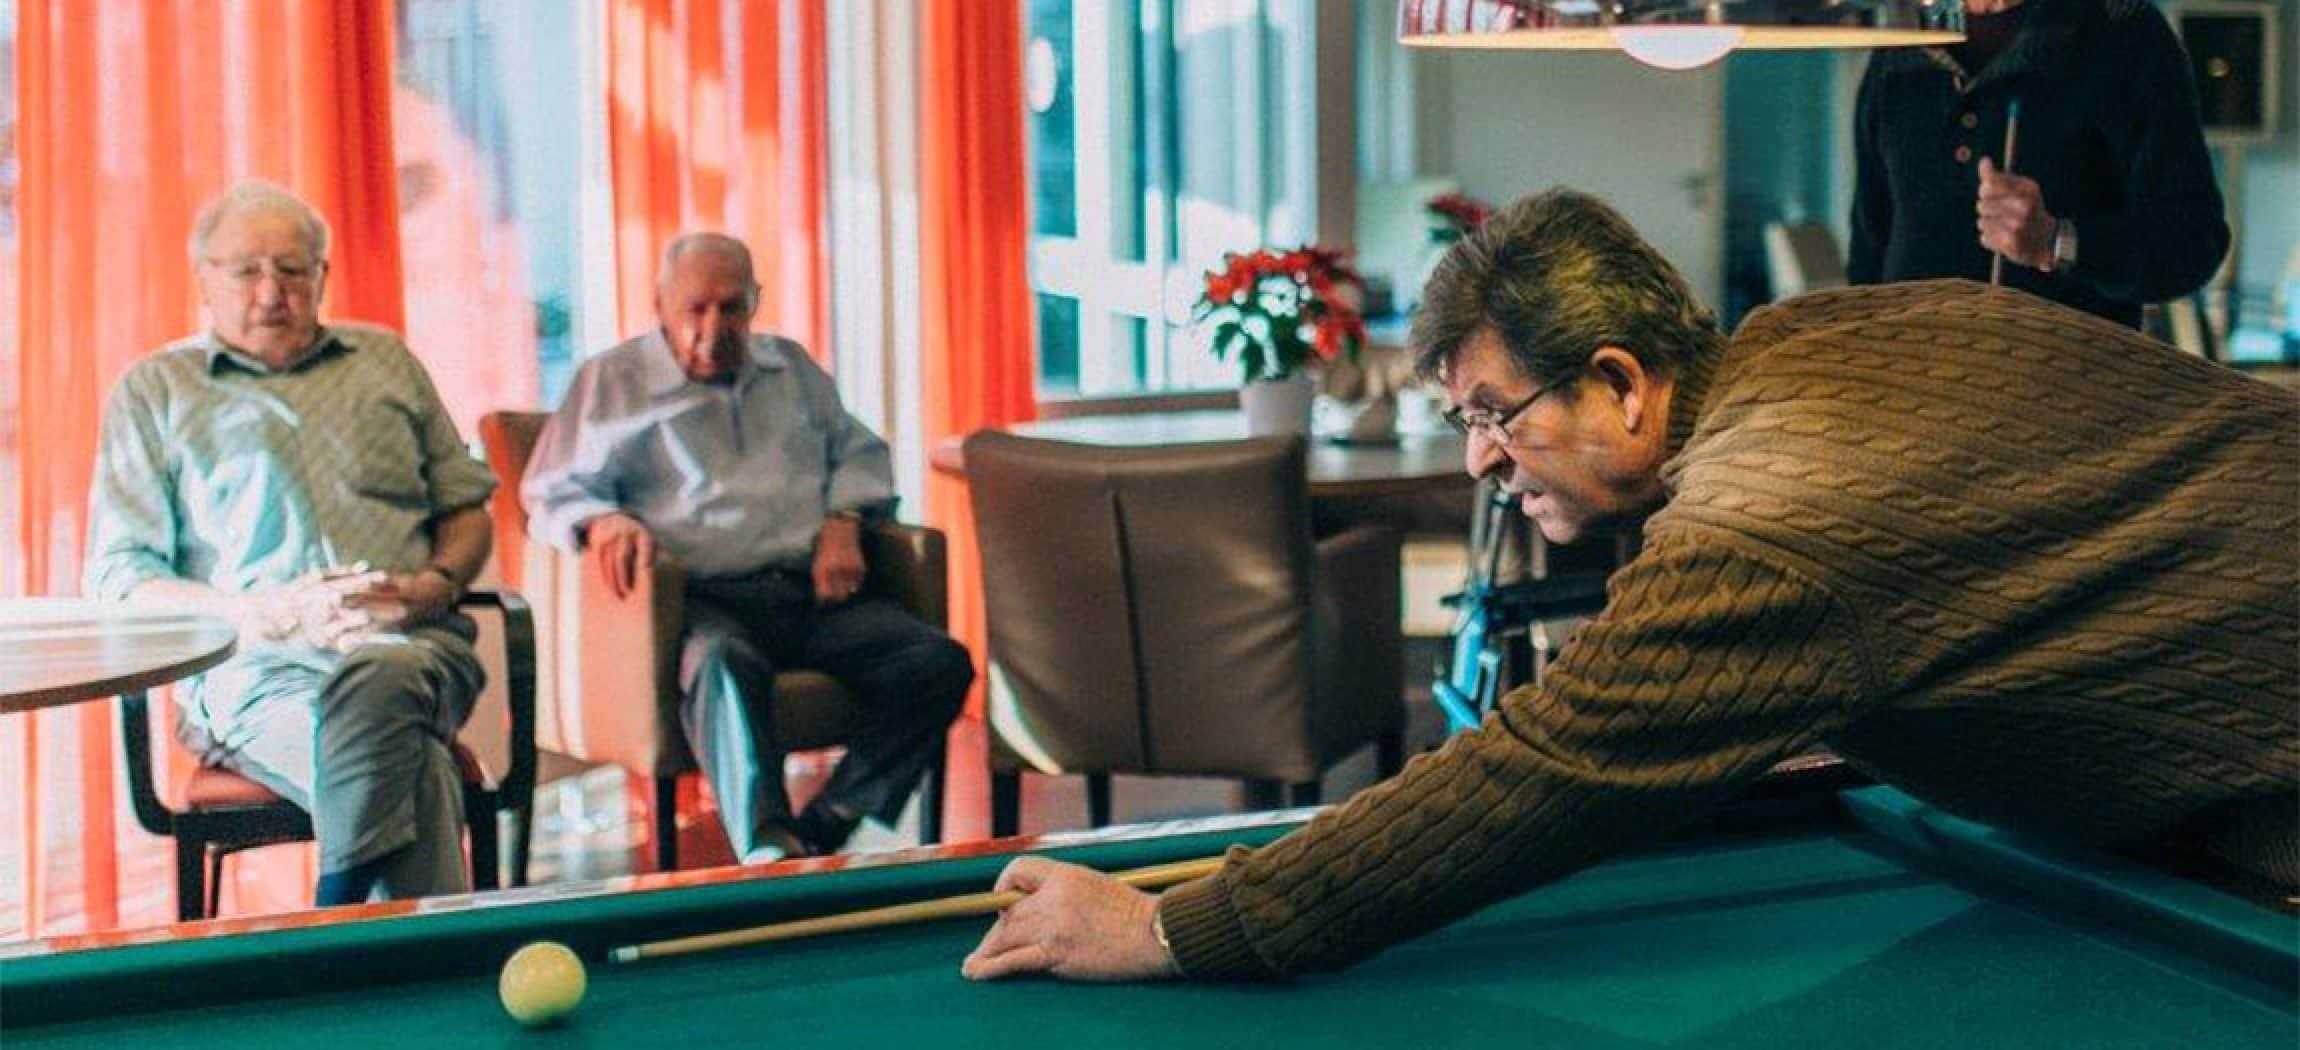 Biljarttafel en oudere mannen die naar biljartspel kijken